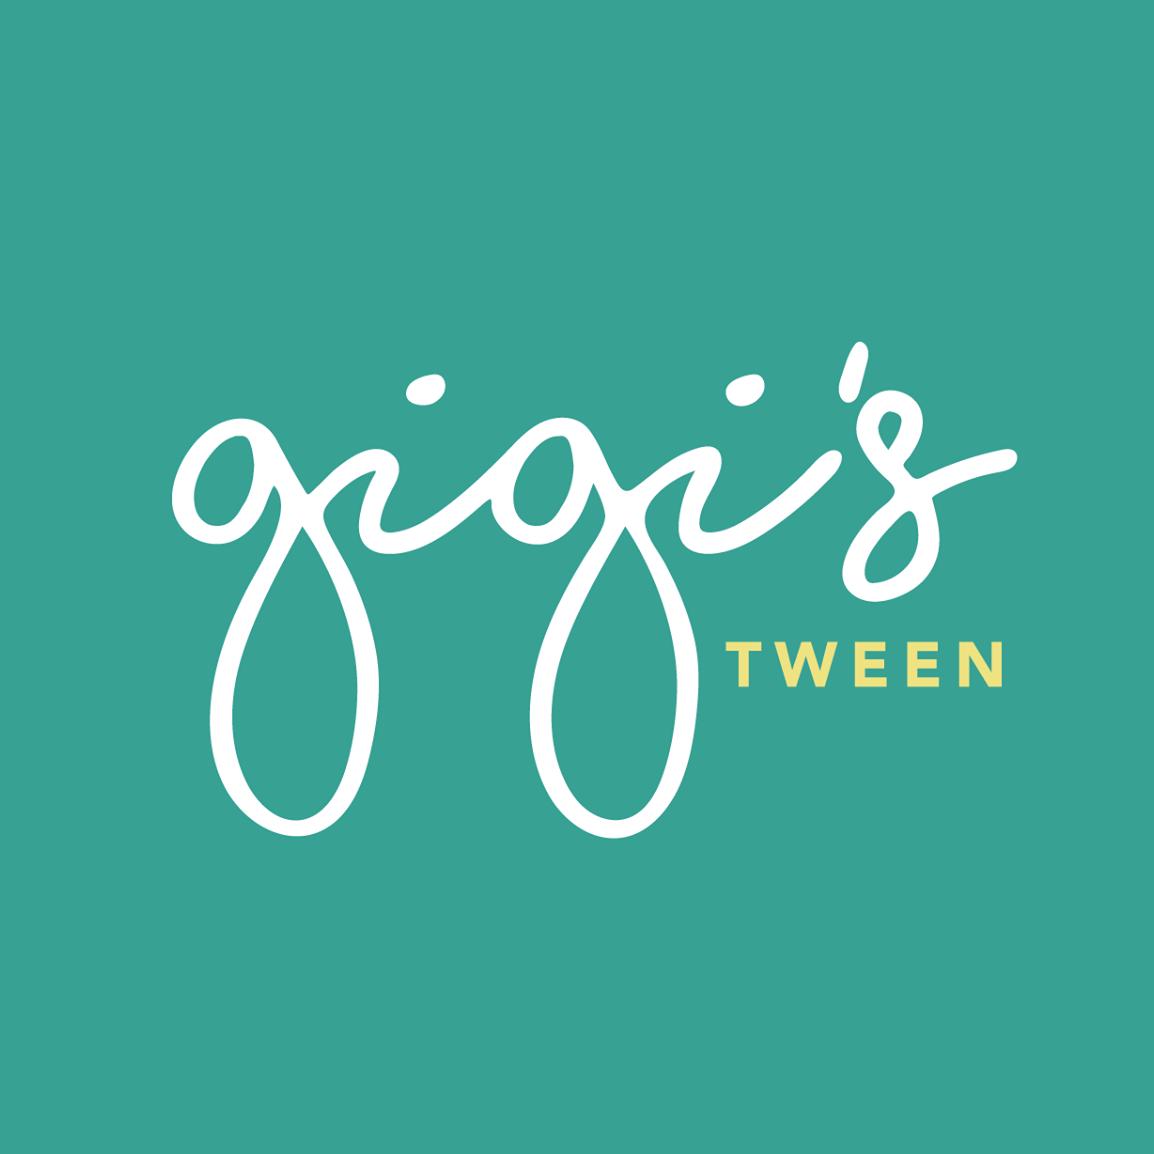 Gigis Tween logo